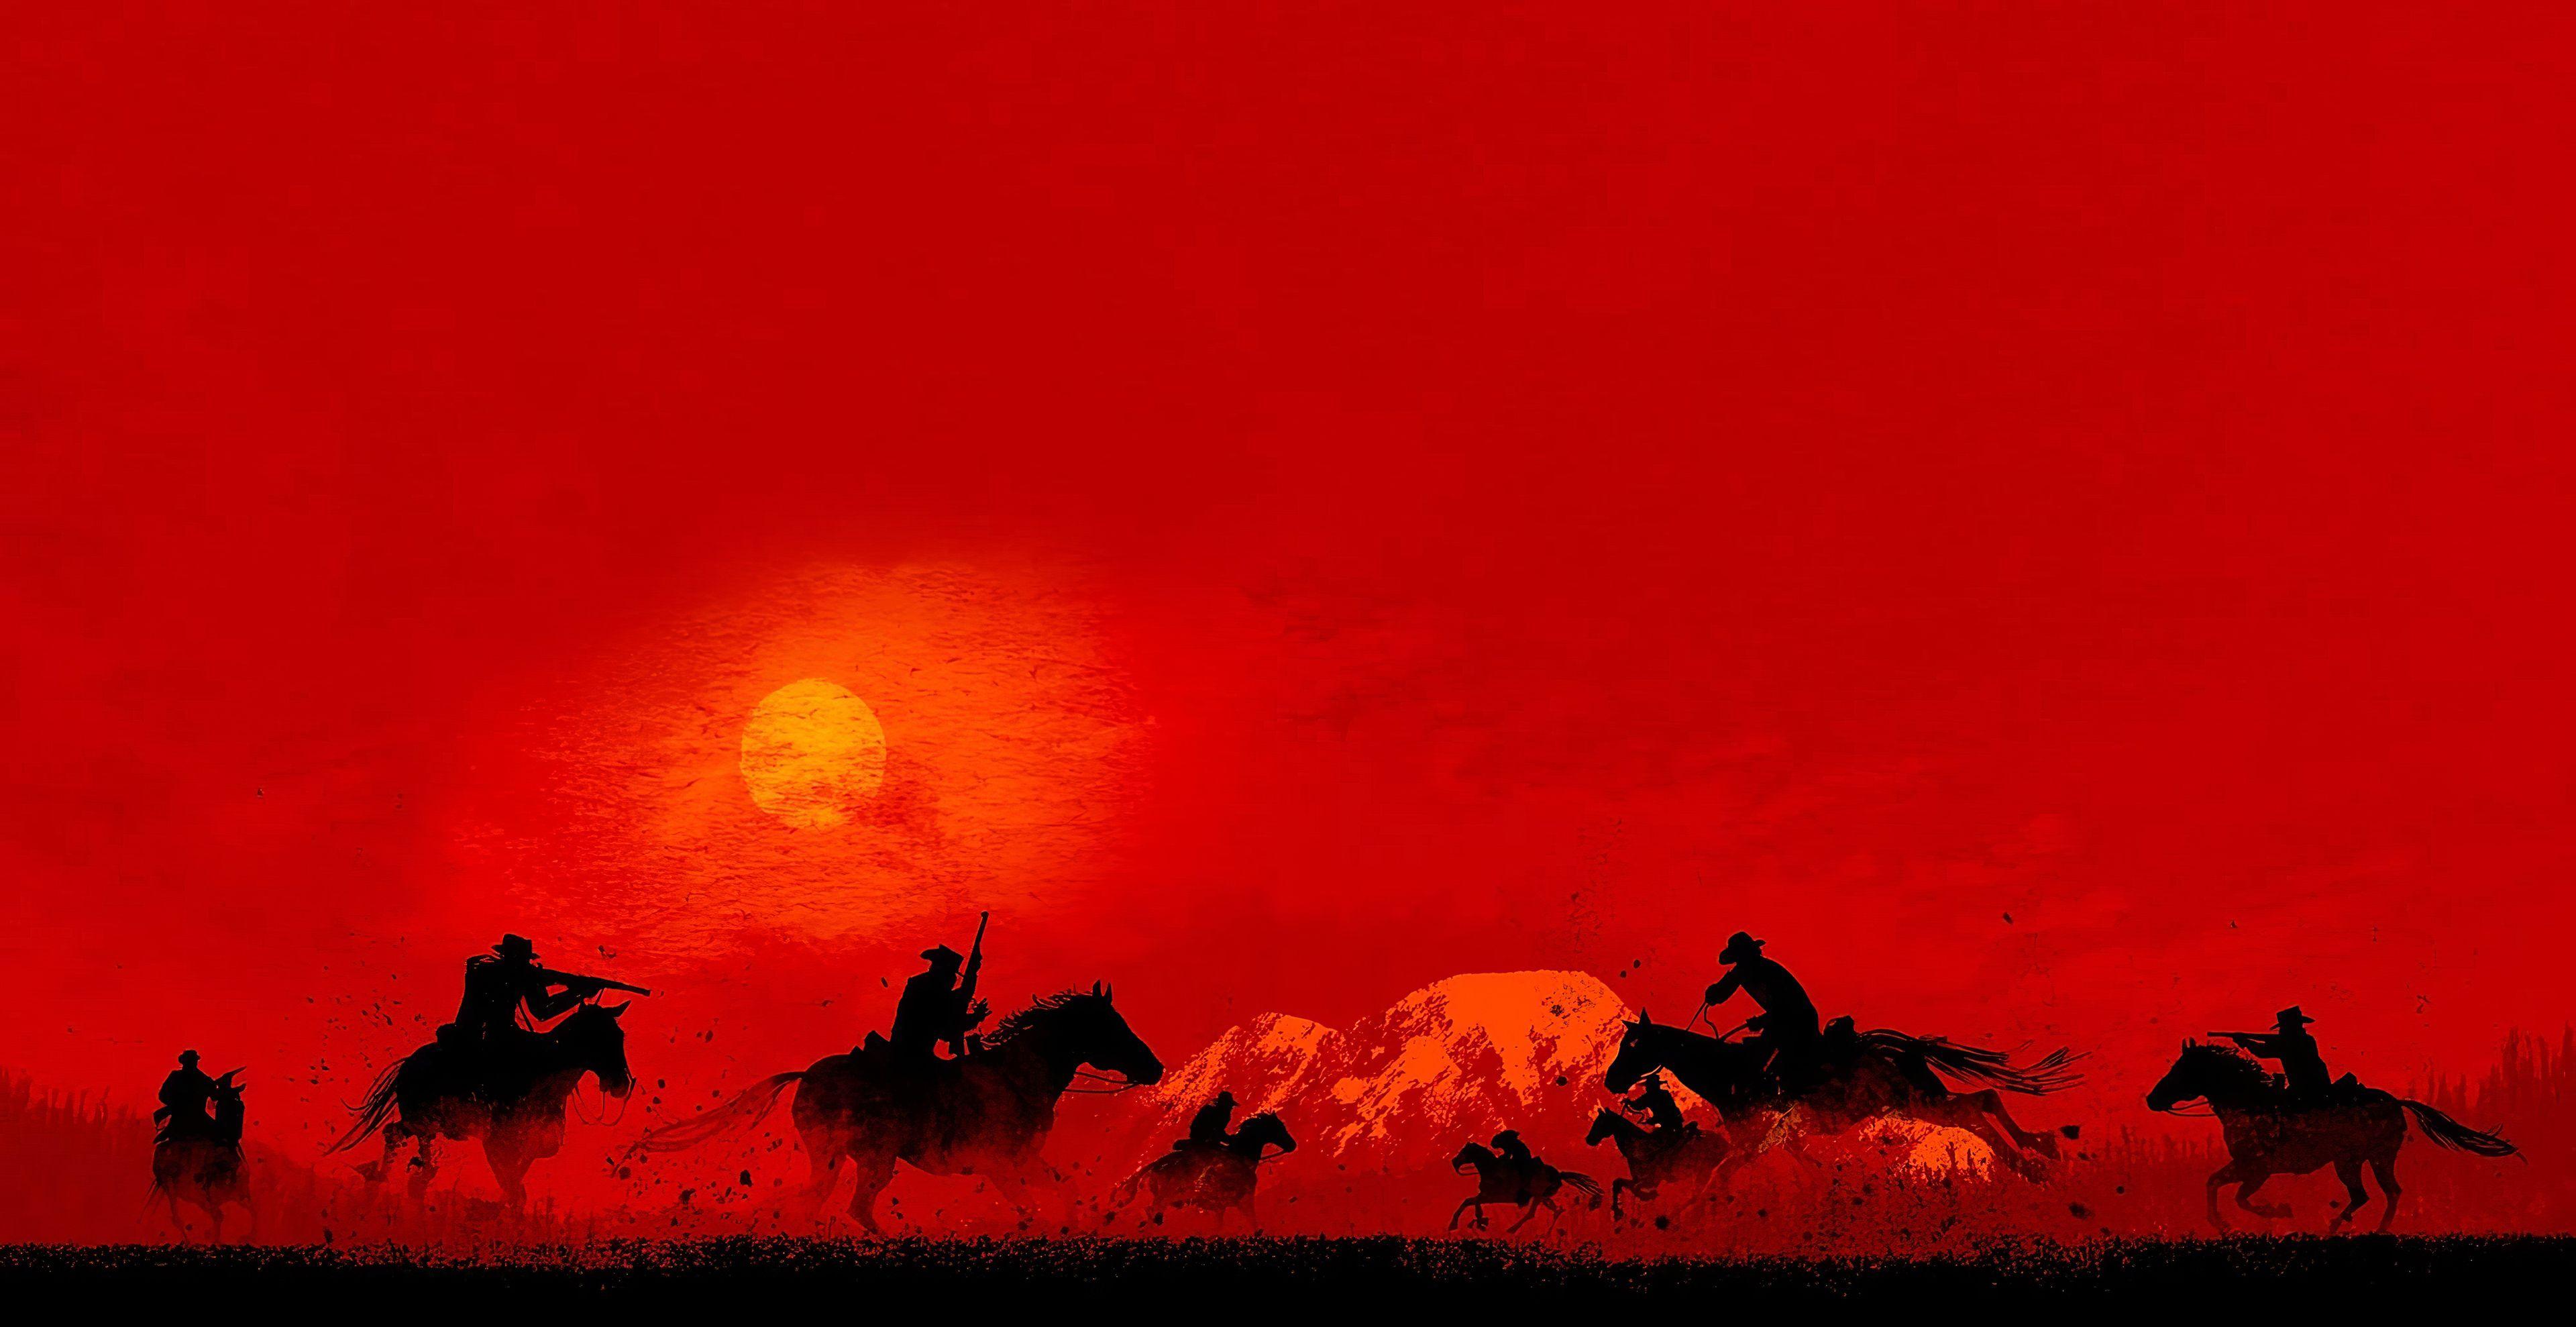 Red Dead Redemption 2 3840x2160 Red Dead Online Red Dead Redemption Wallpaper